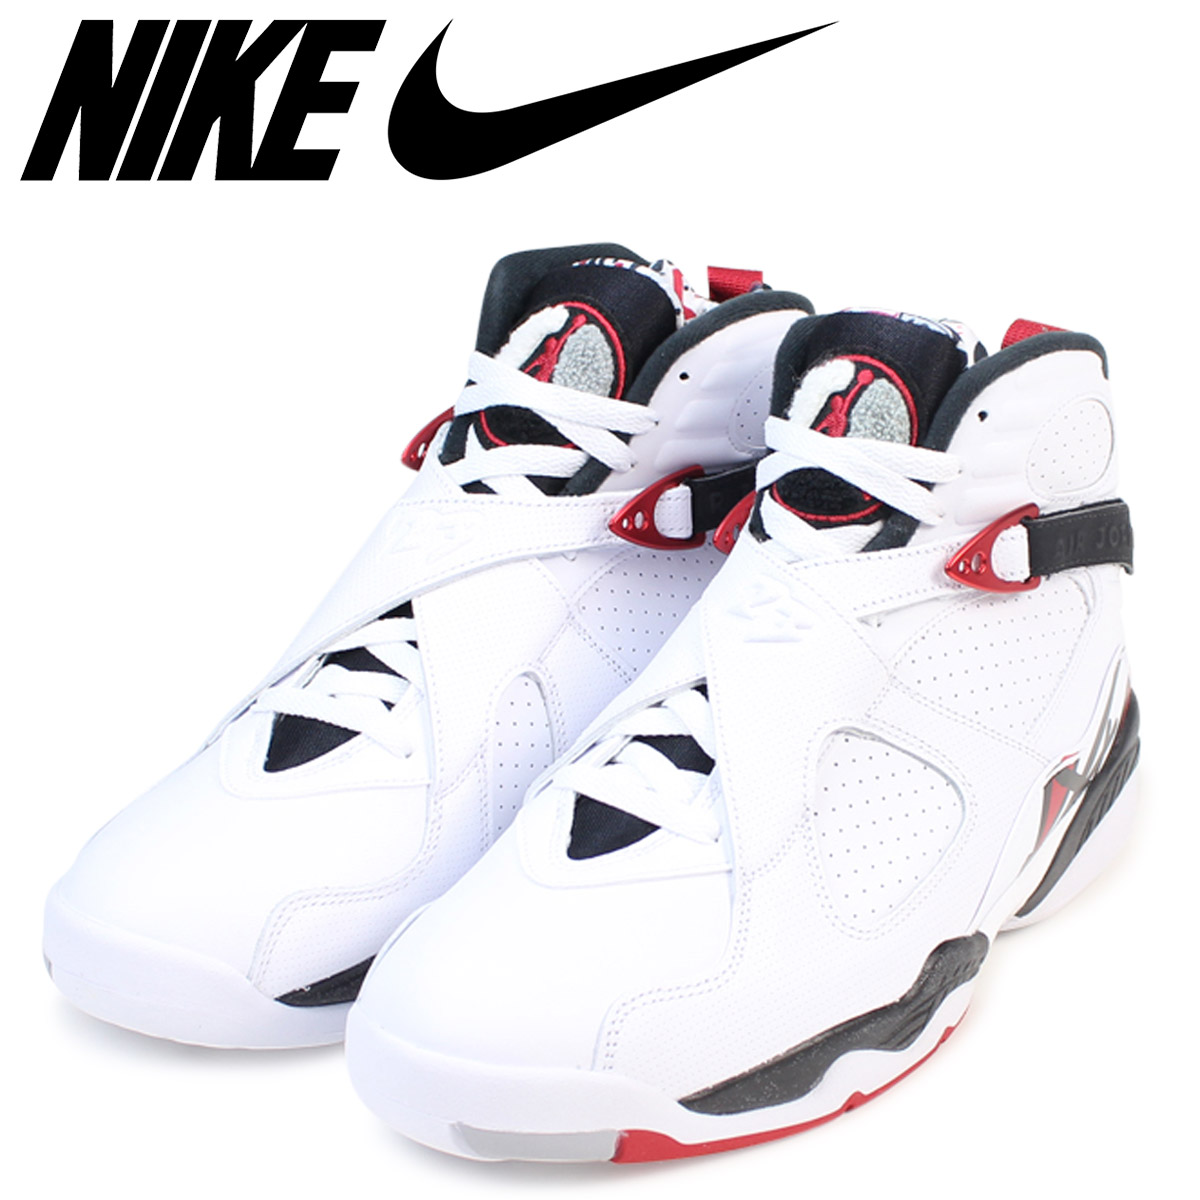 separation shoes 14d1e cc078 Nike NIKE Air Jordan 8 nostalgic sneakers AIR JORDAN 8 RETRO ALTERNATE men  305,381-104 white